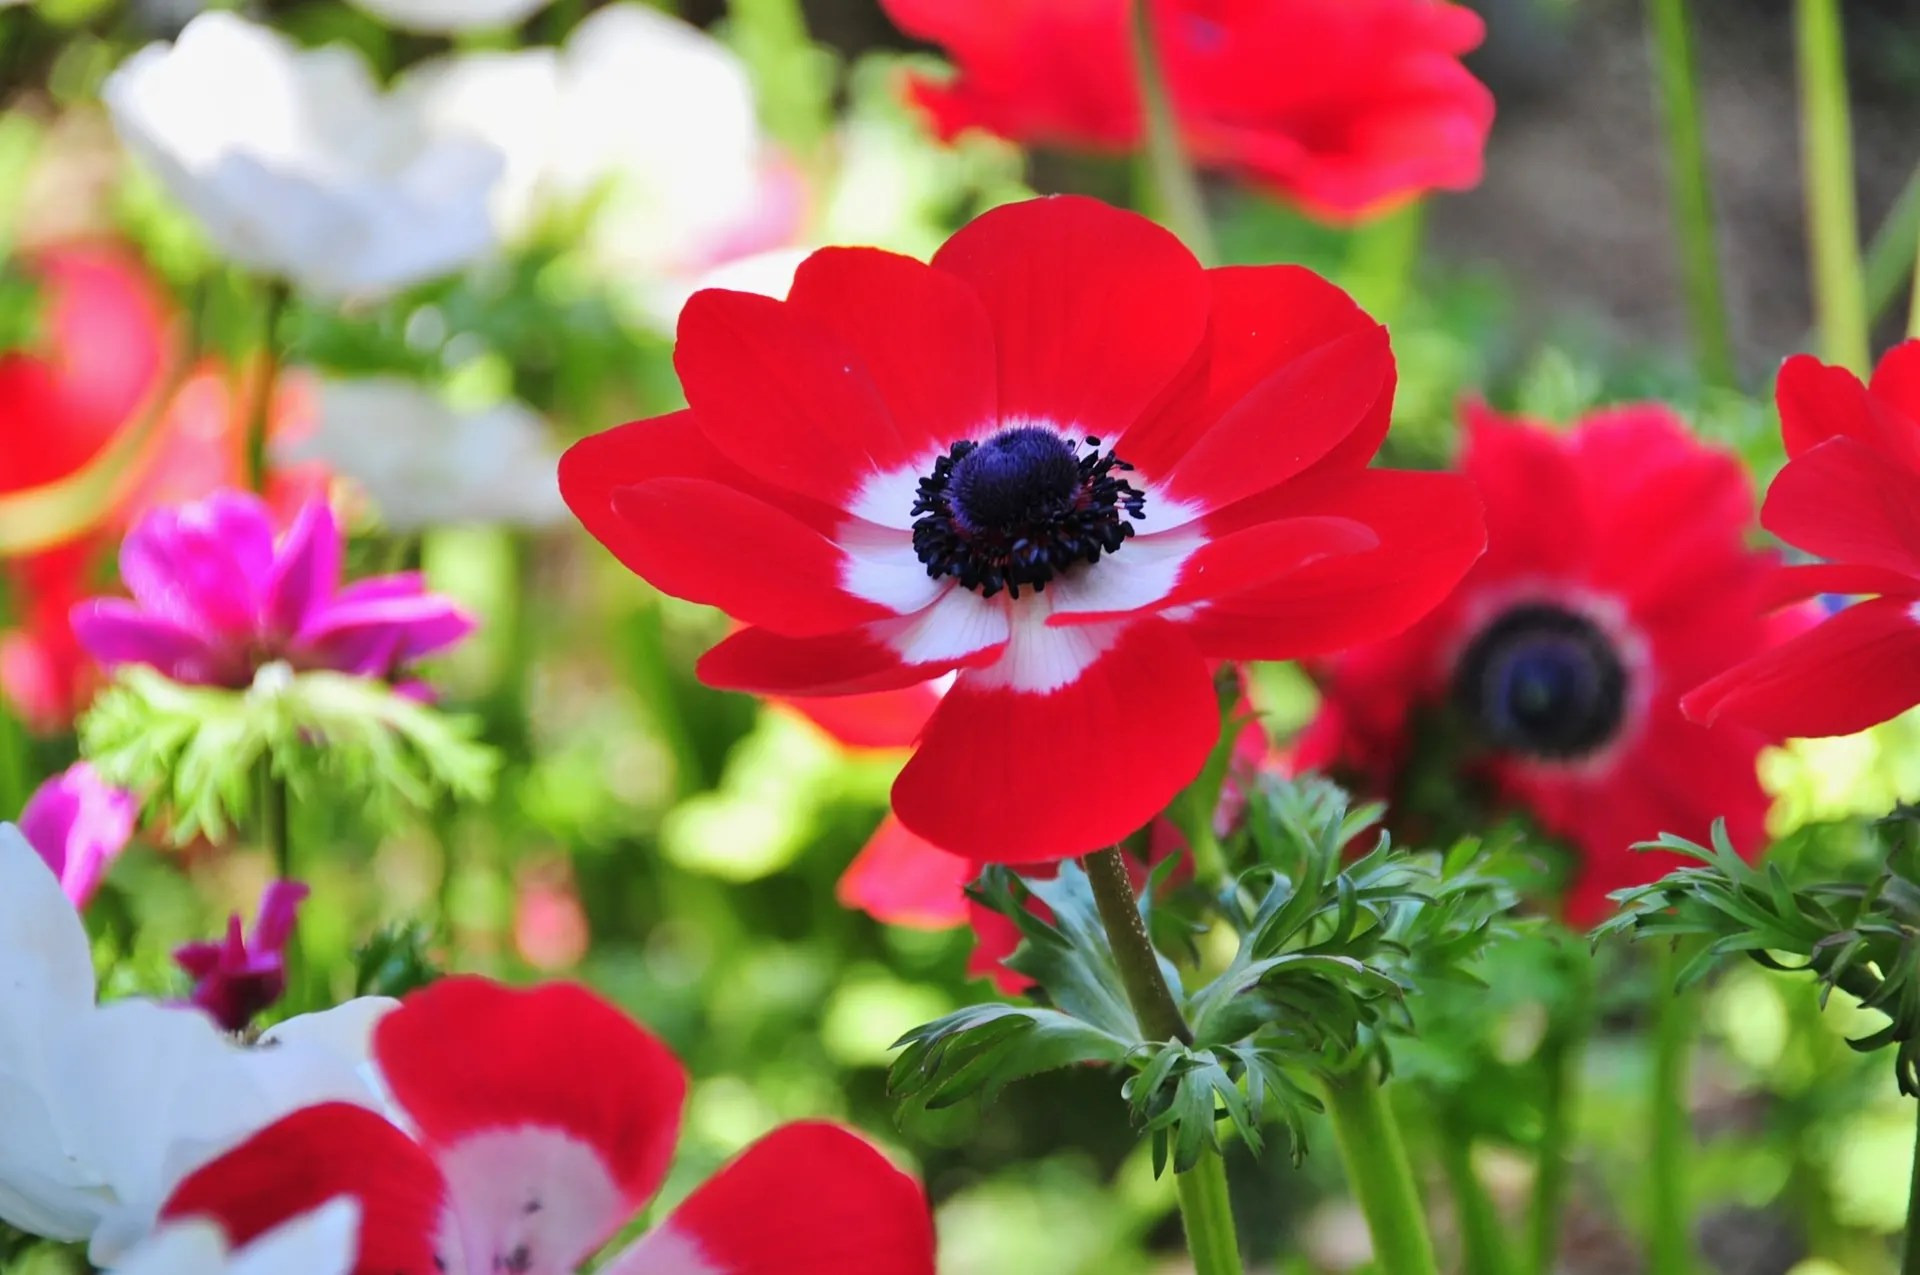 過去の寫真~5月の花風景 - 綺麗な寫真 日々出來事